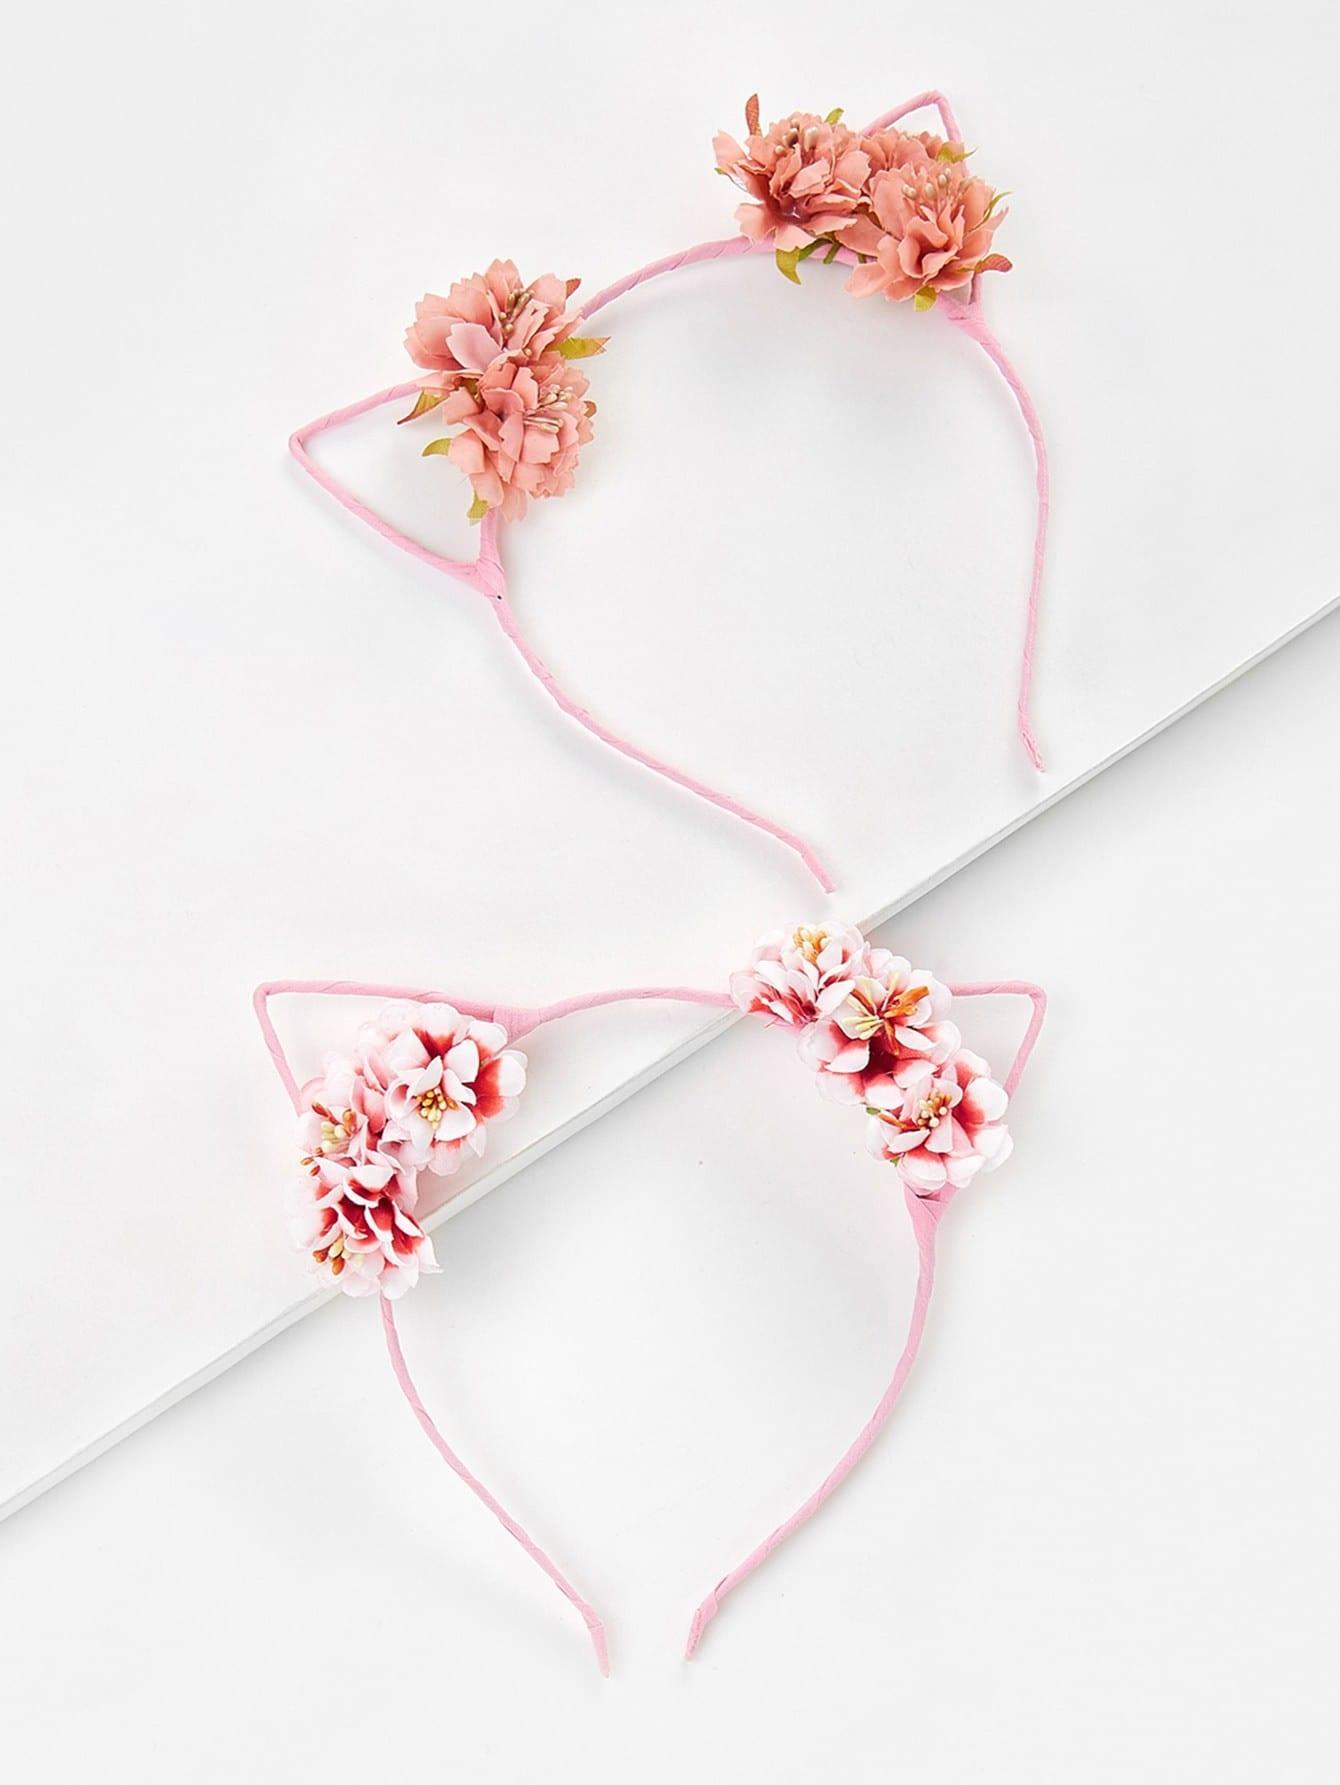 Cat Ear Flower Decorated Headband 2pcs lace cat ear design headband 2pcs